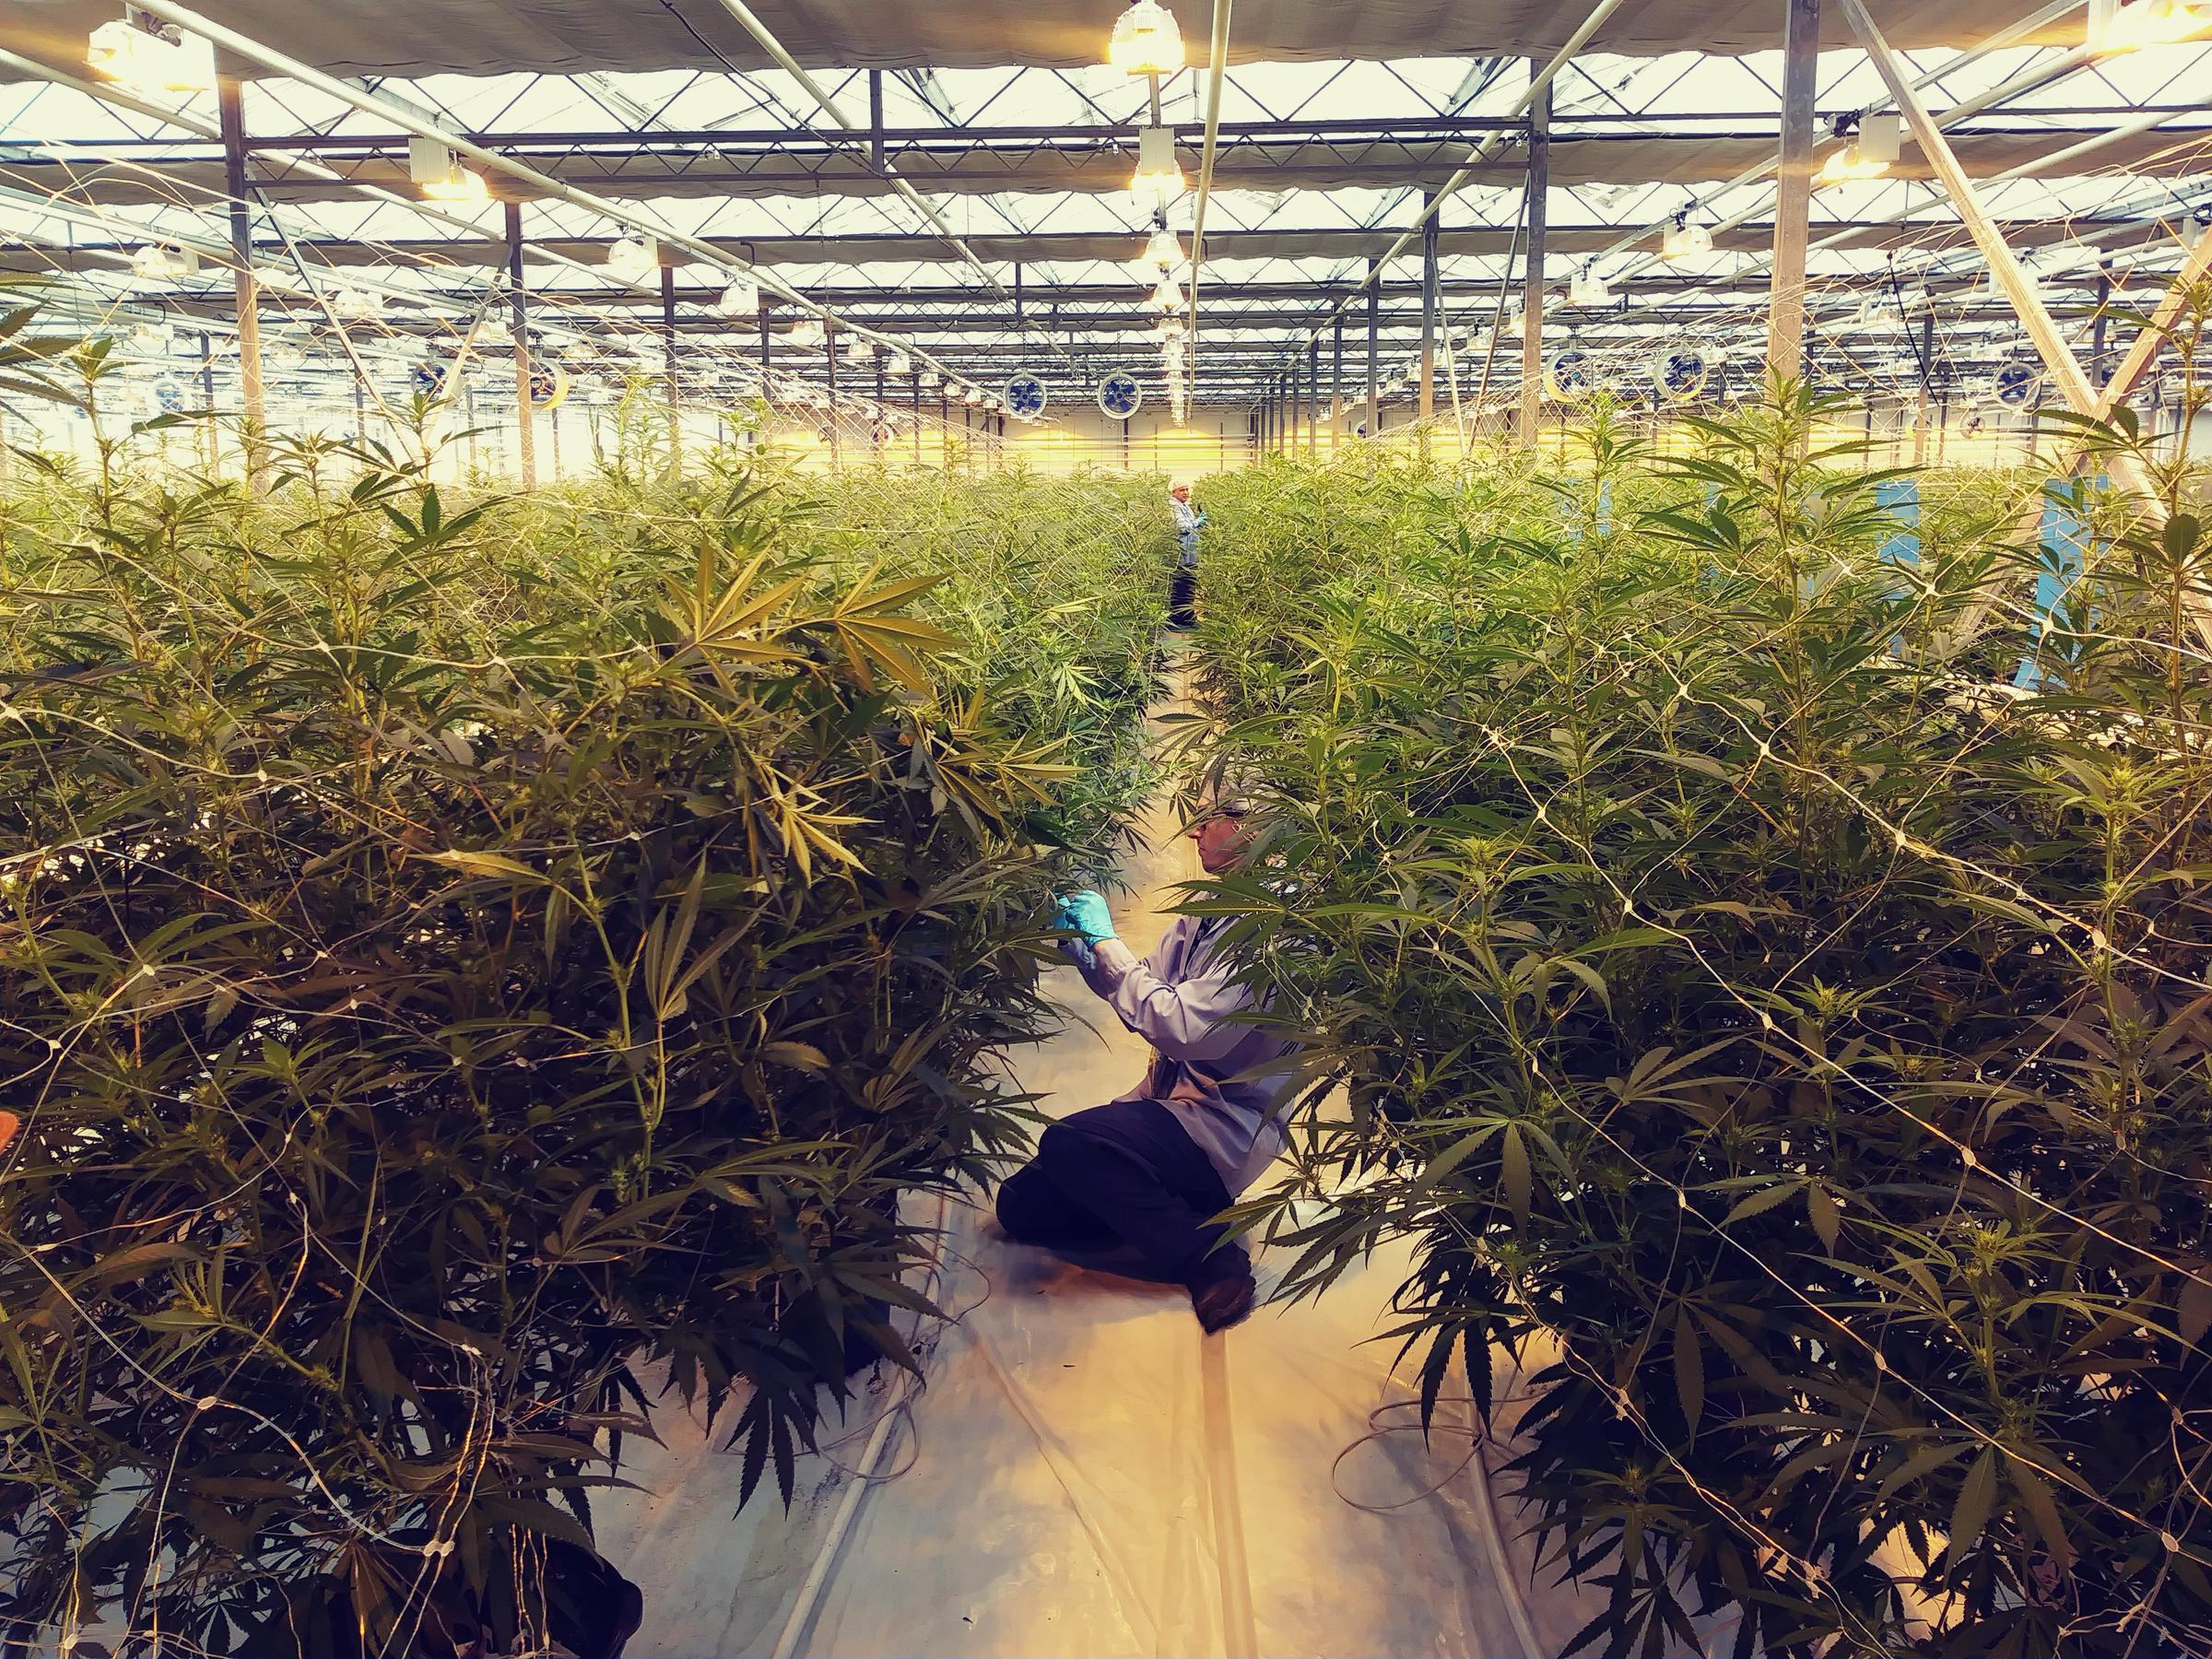 Huge pot farm coming to Great Lakes region   WBFO